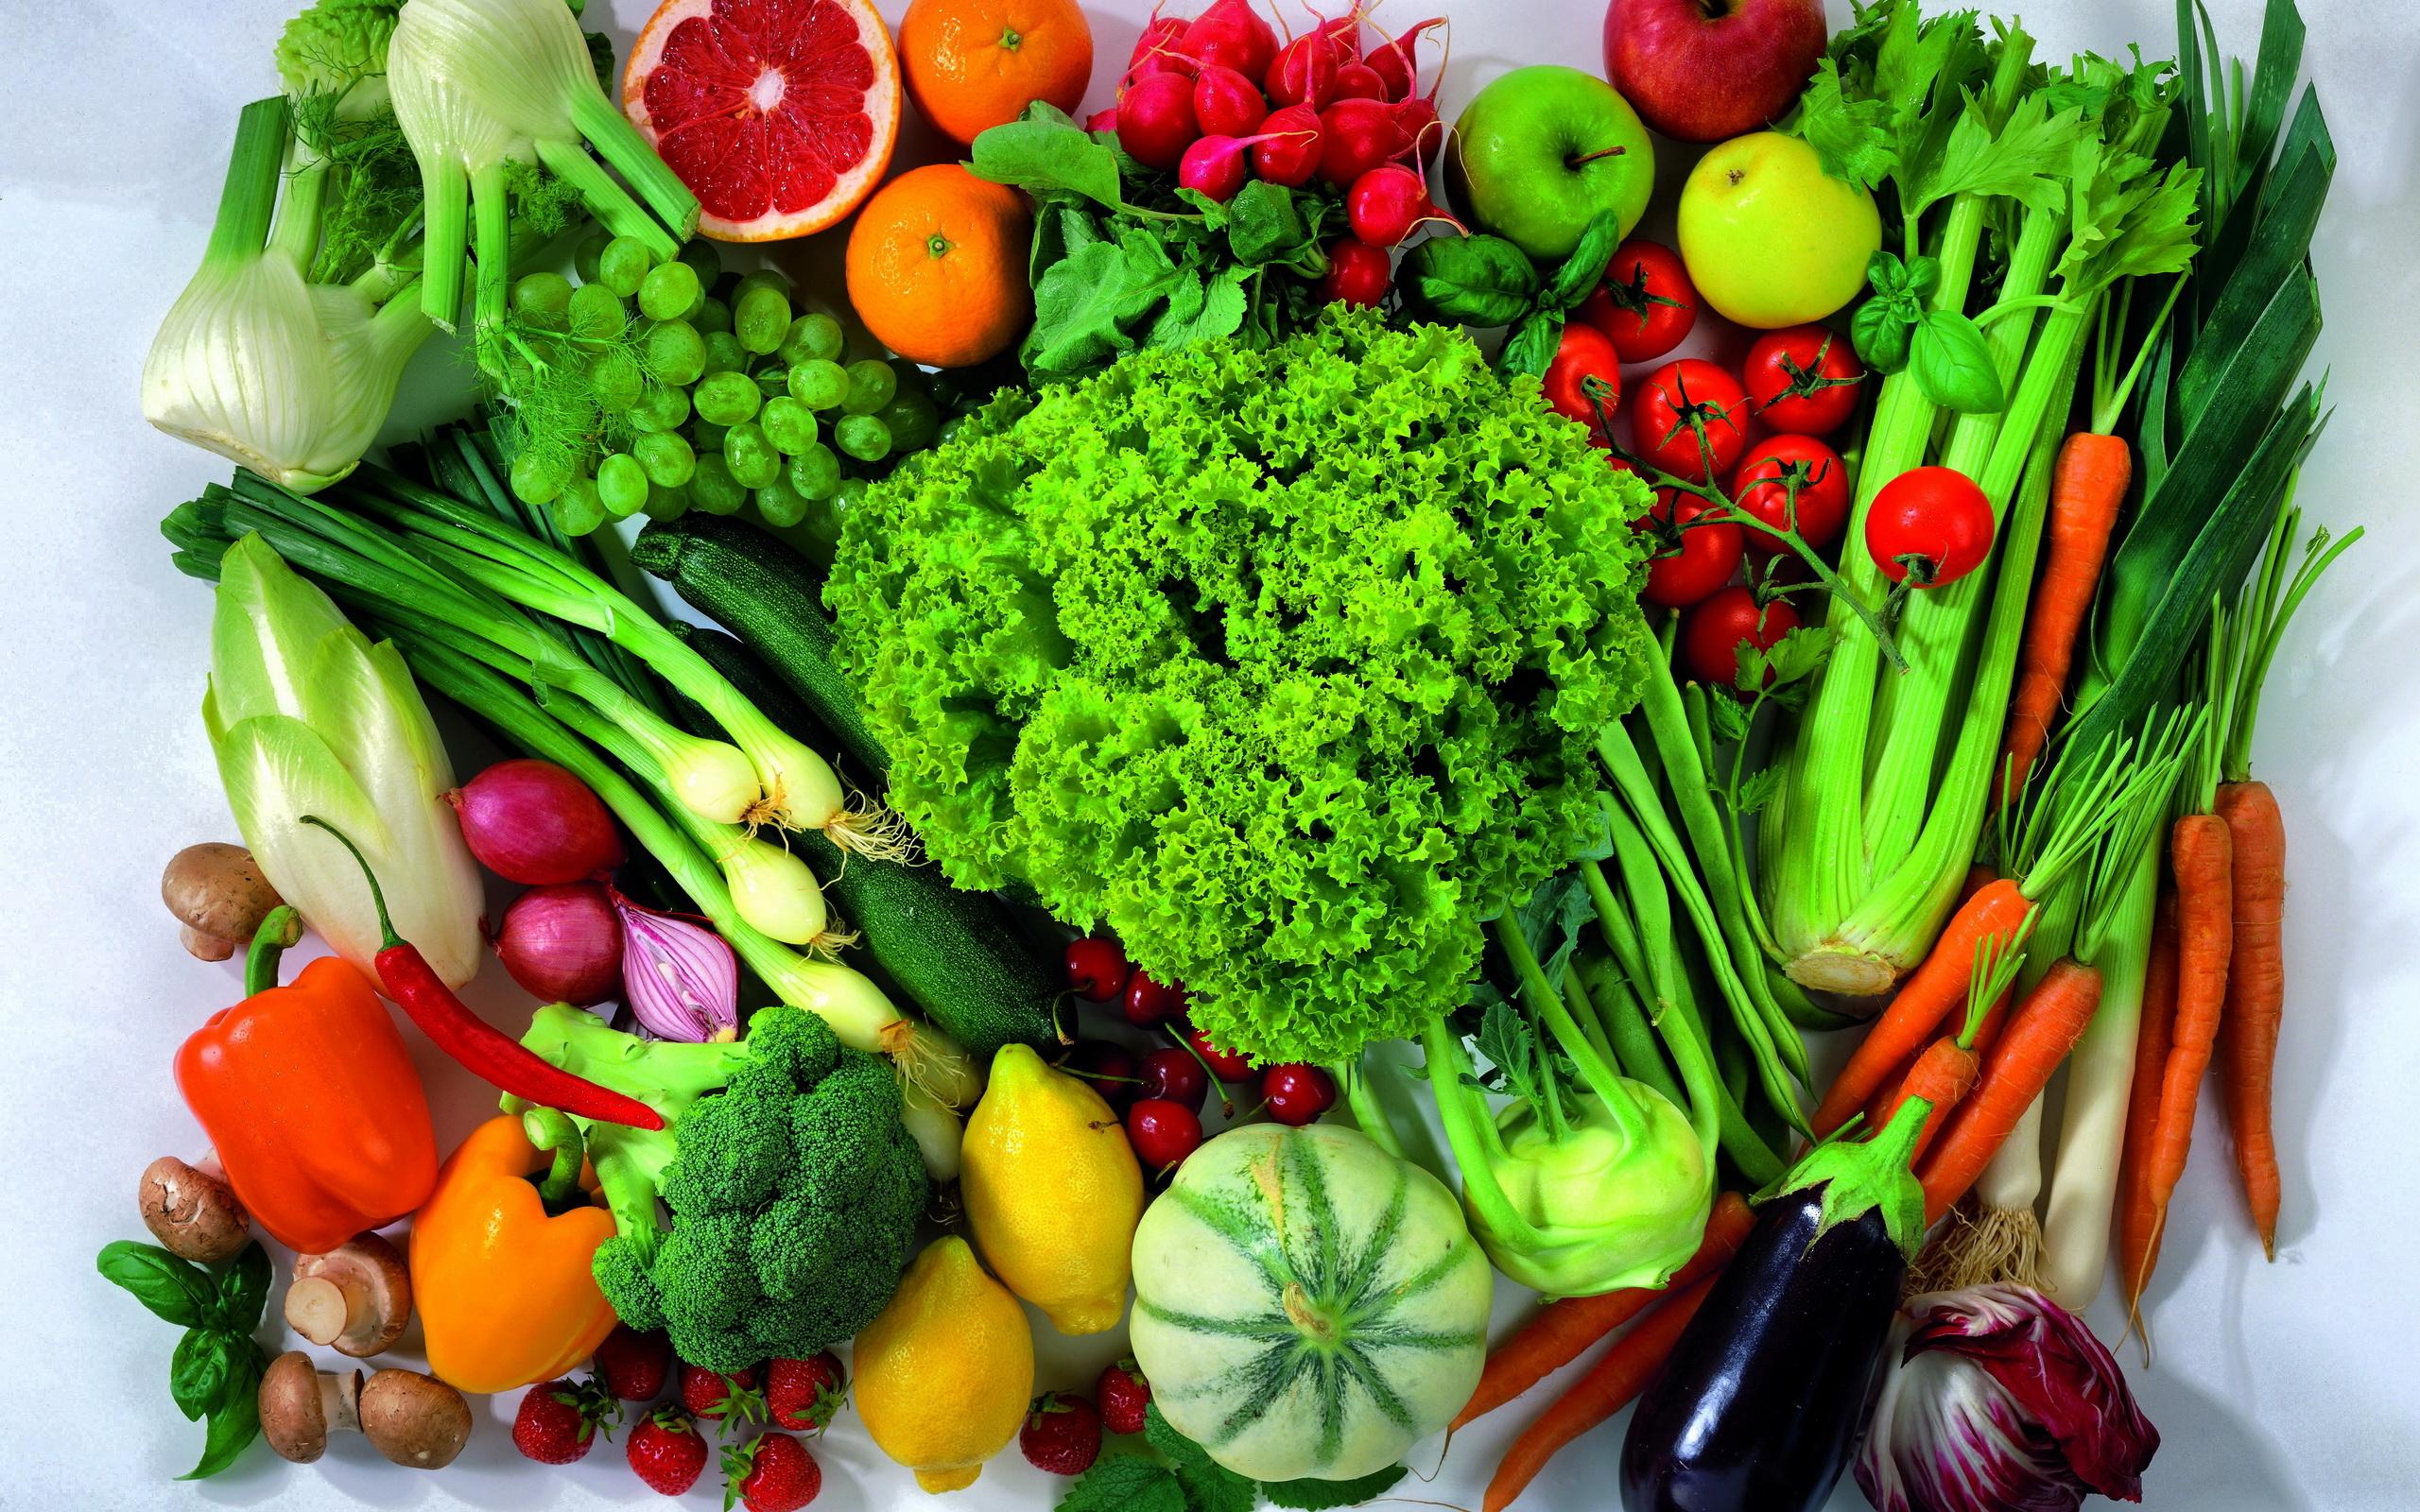 original wallpaper download Fruit and vegetable mix   2560x1600 2560x1600